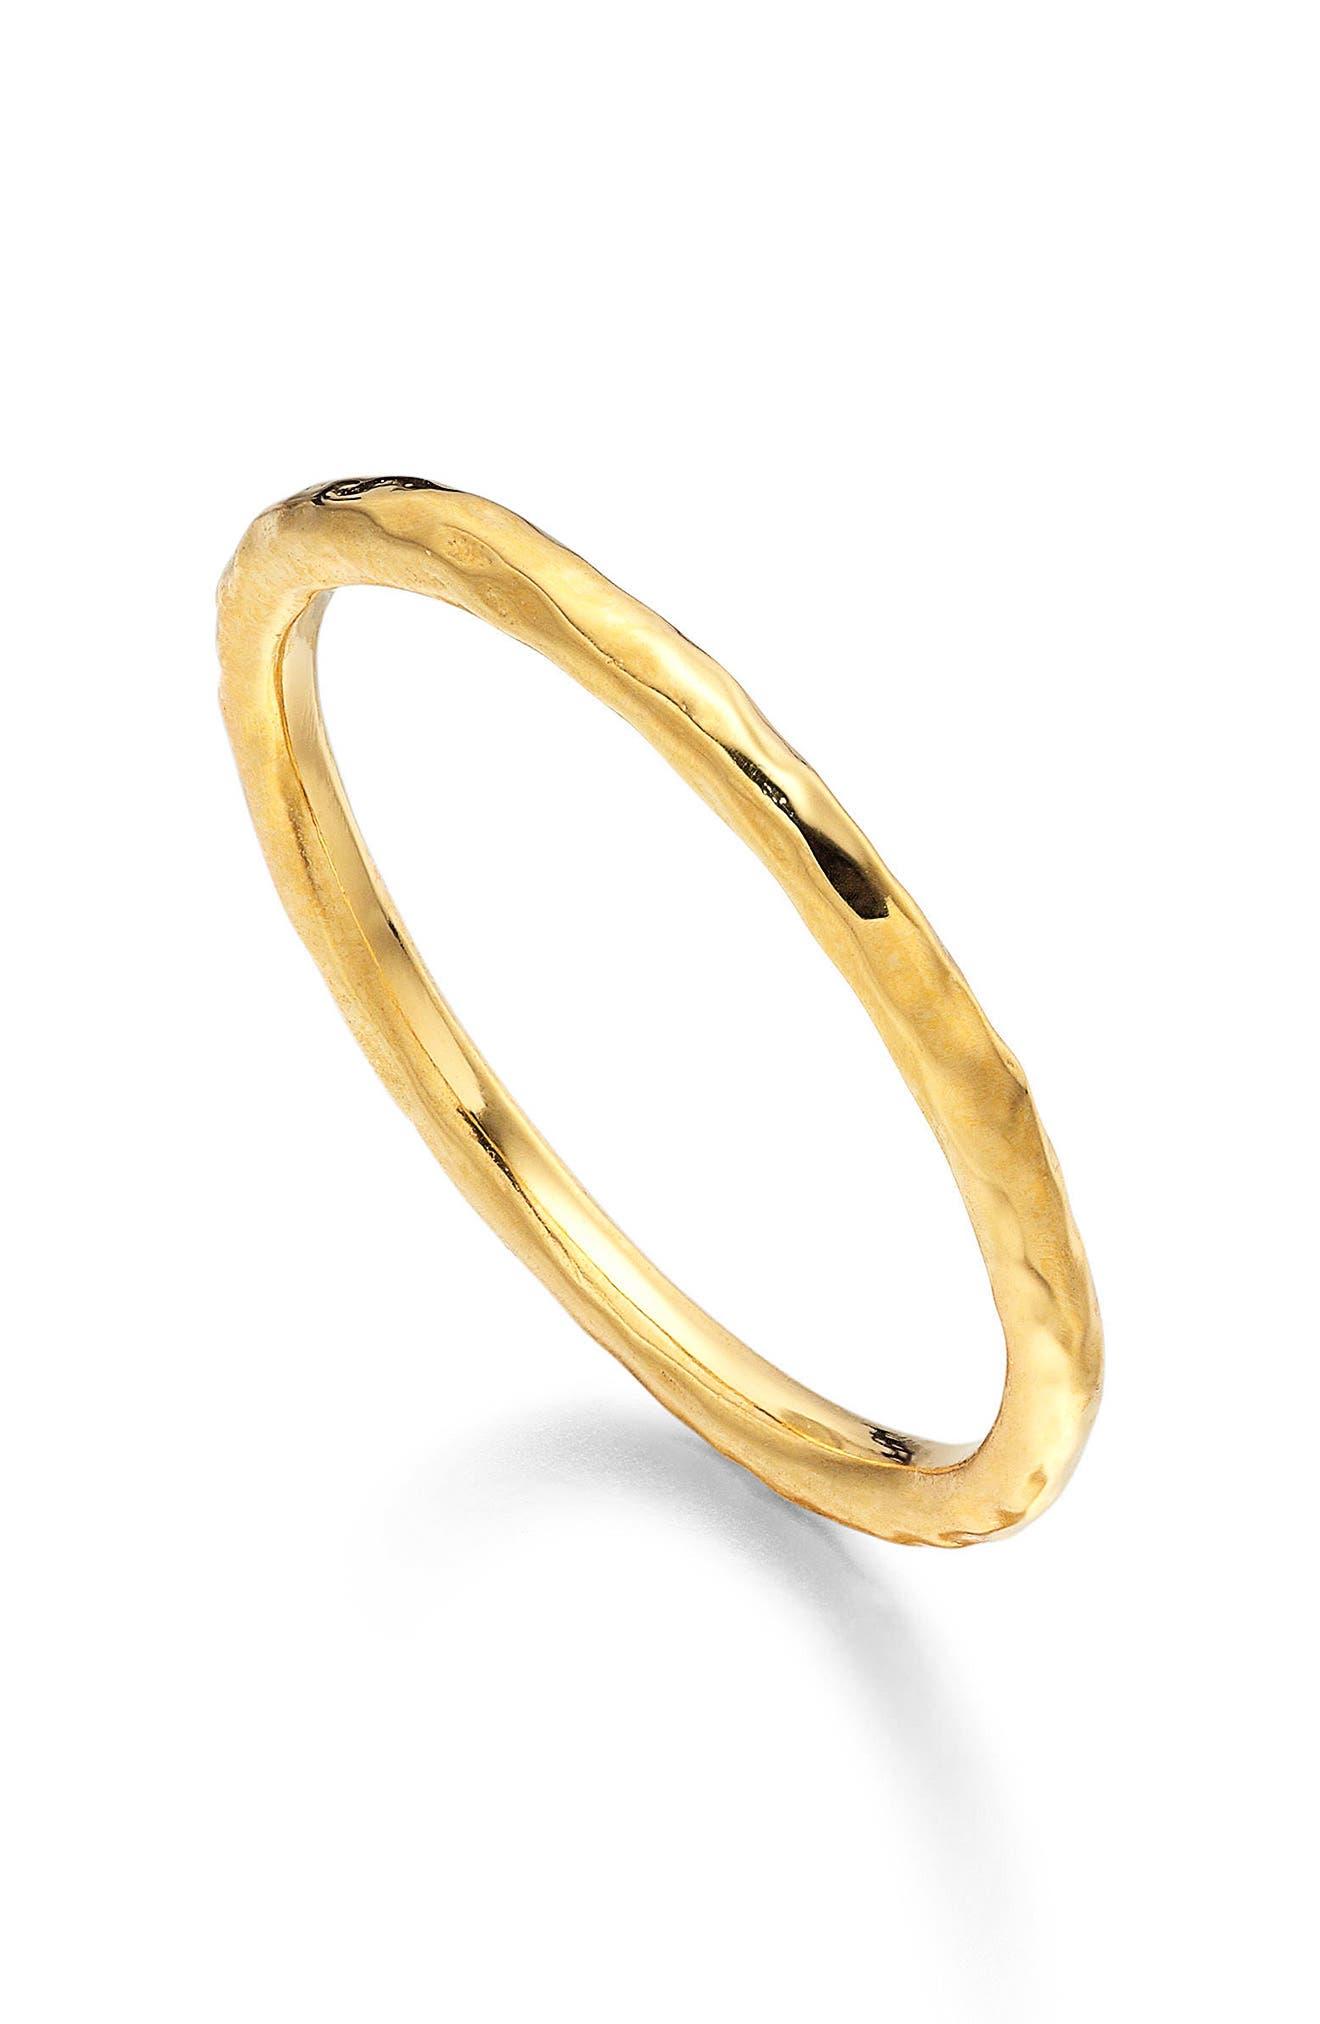 Siren Hammered Ring,                             Main thumbnail 1, color,                             GOLD